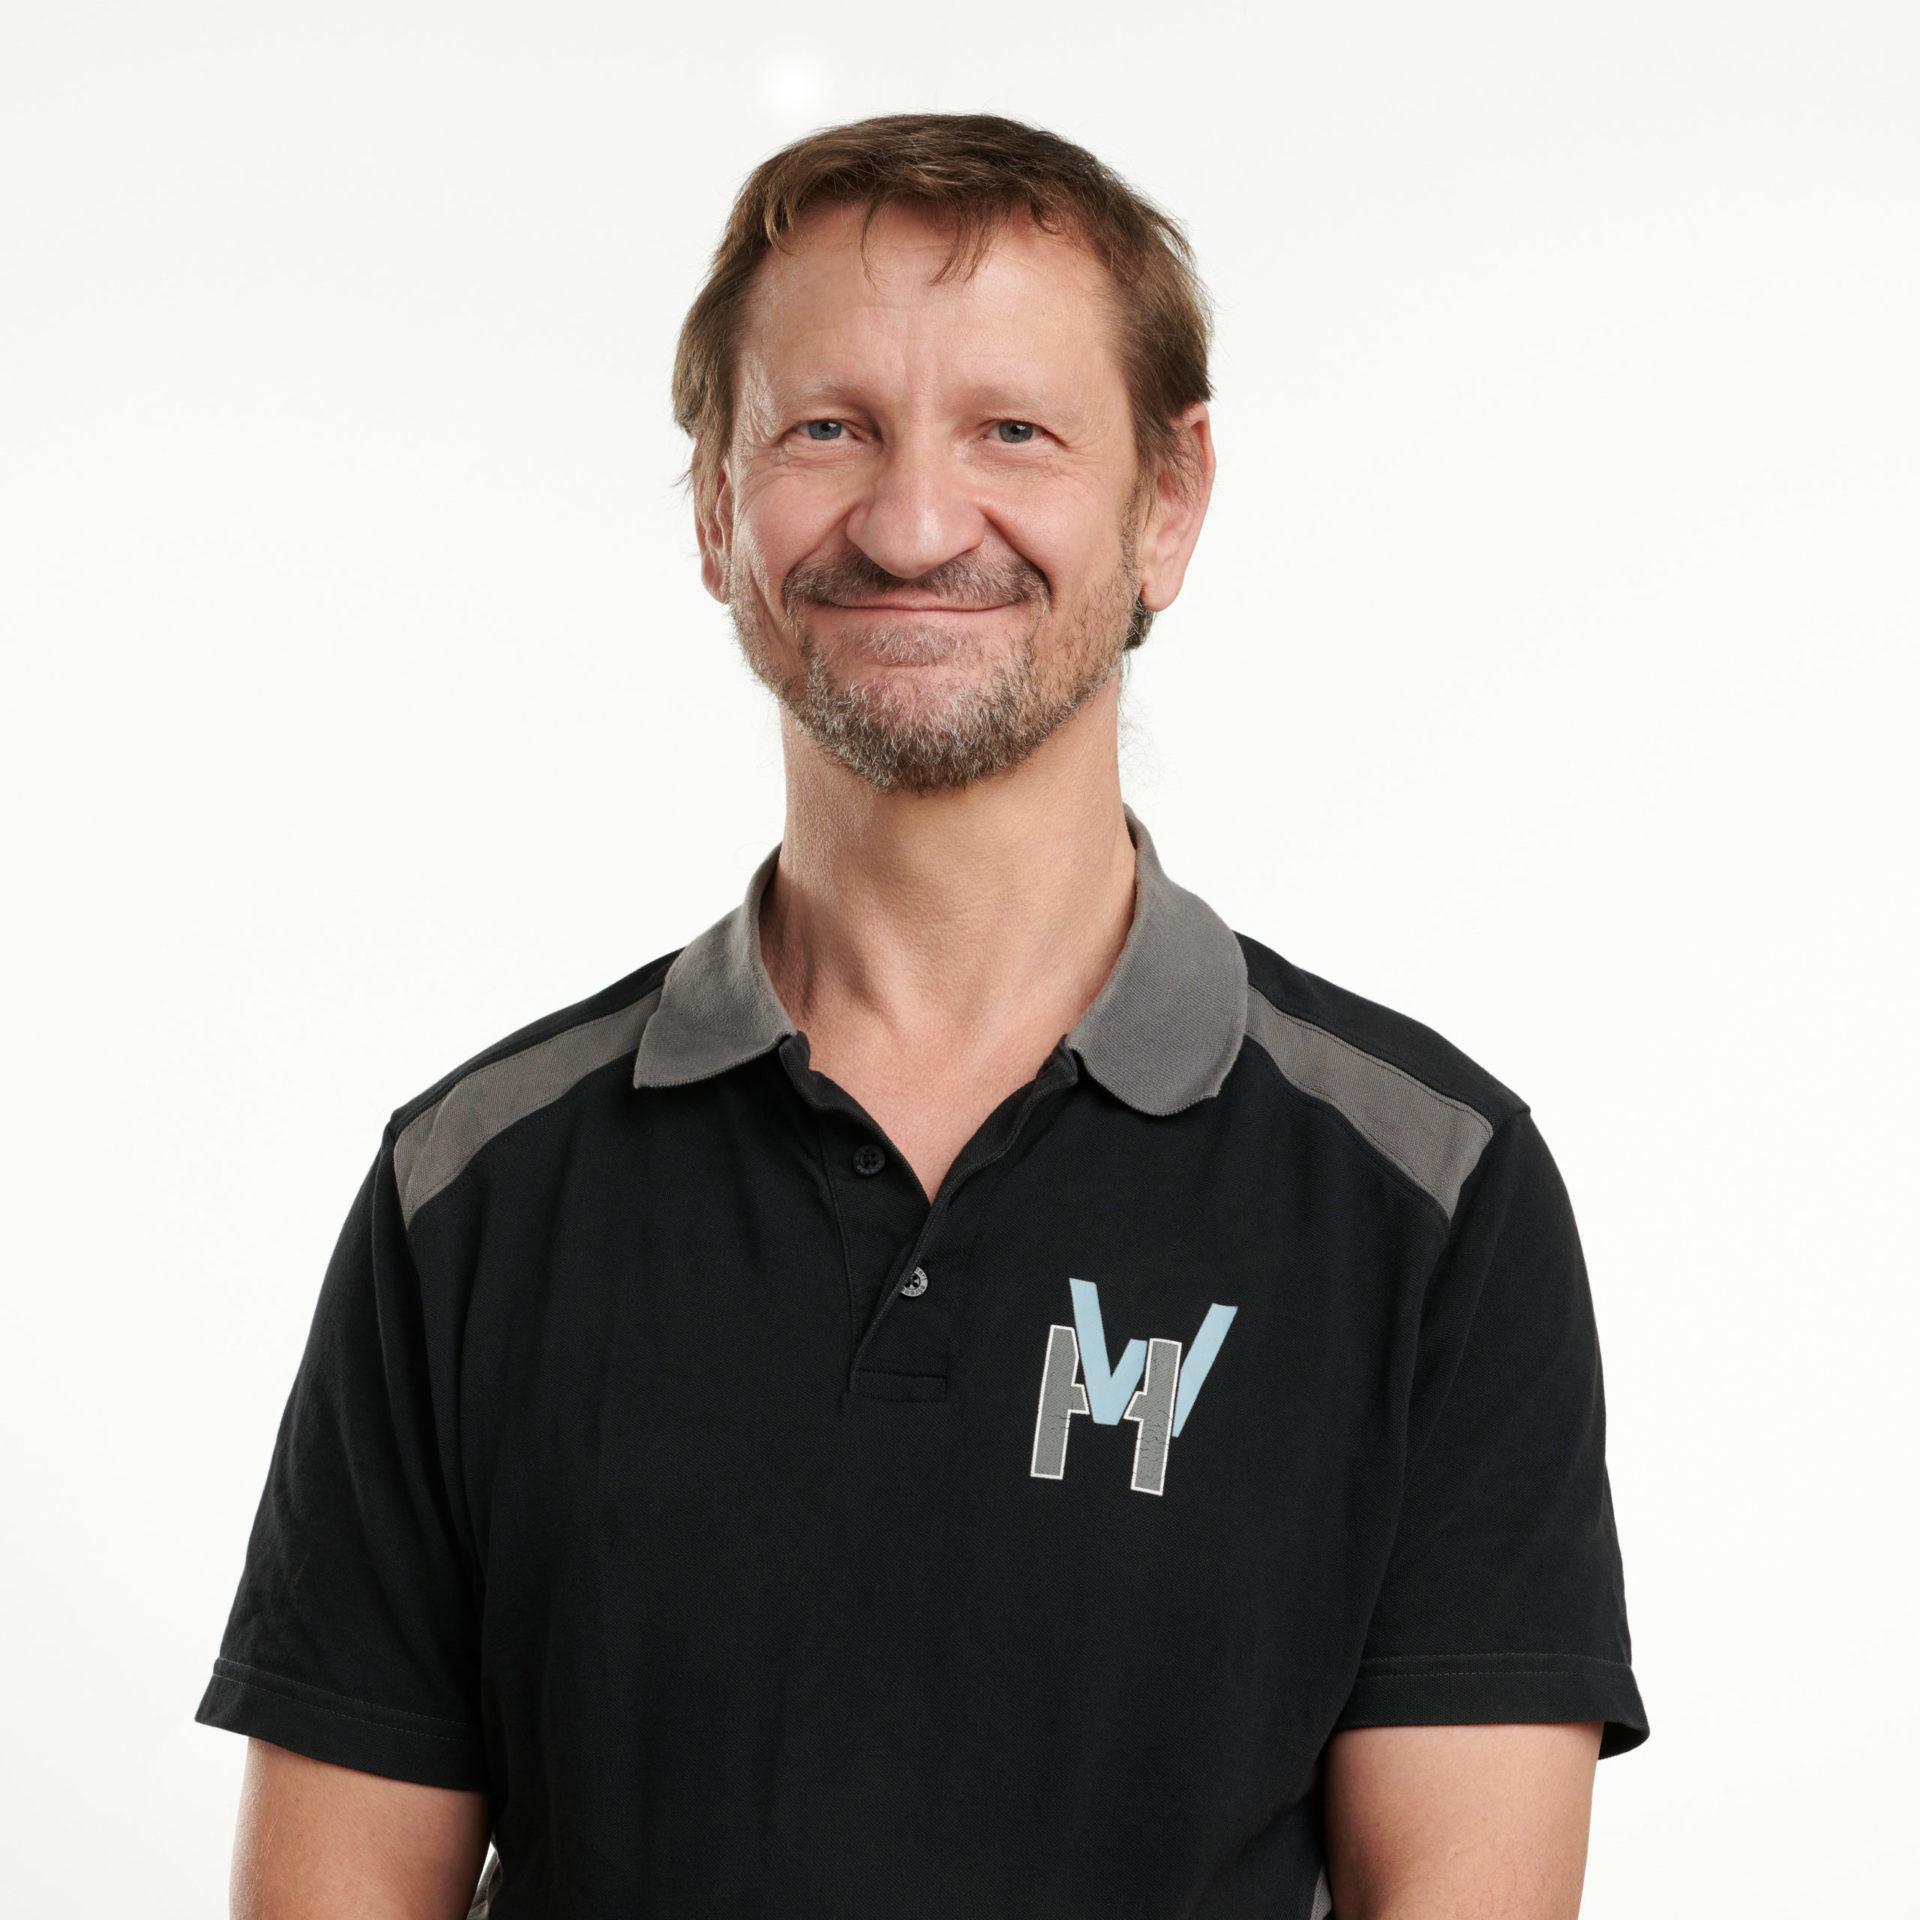 Elektro_HW_Michael_Huebner